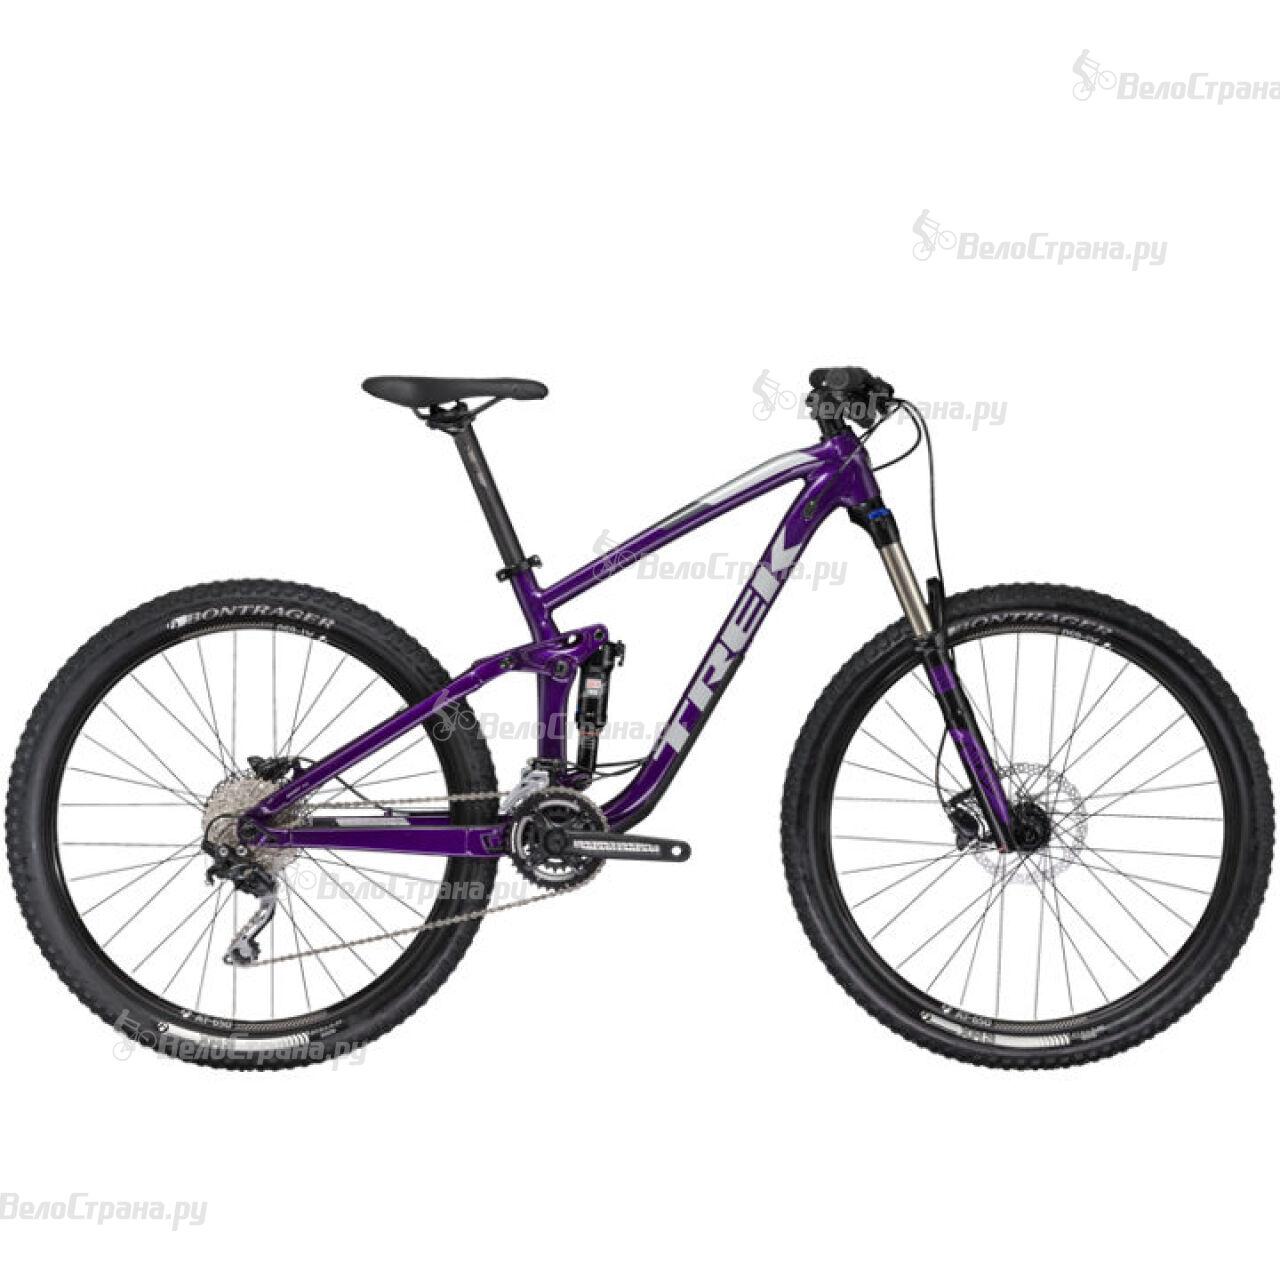 Велосипед Trek Fuel EX 5 WSD (2017)